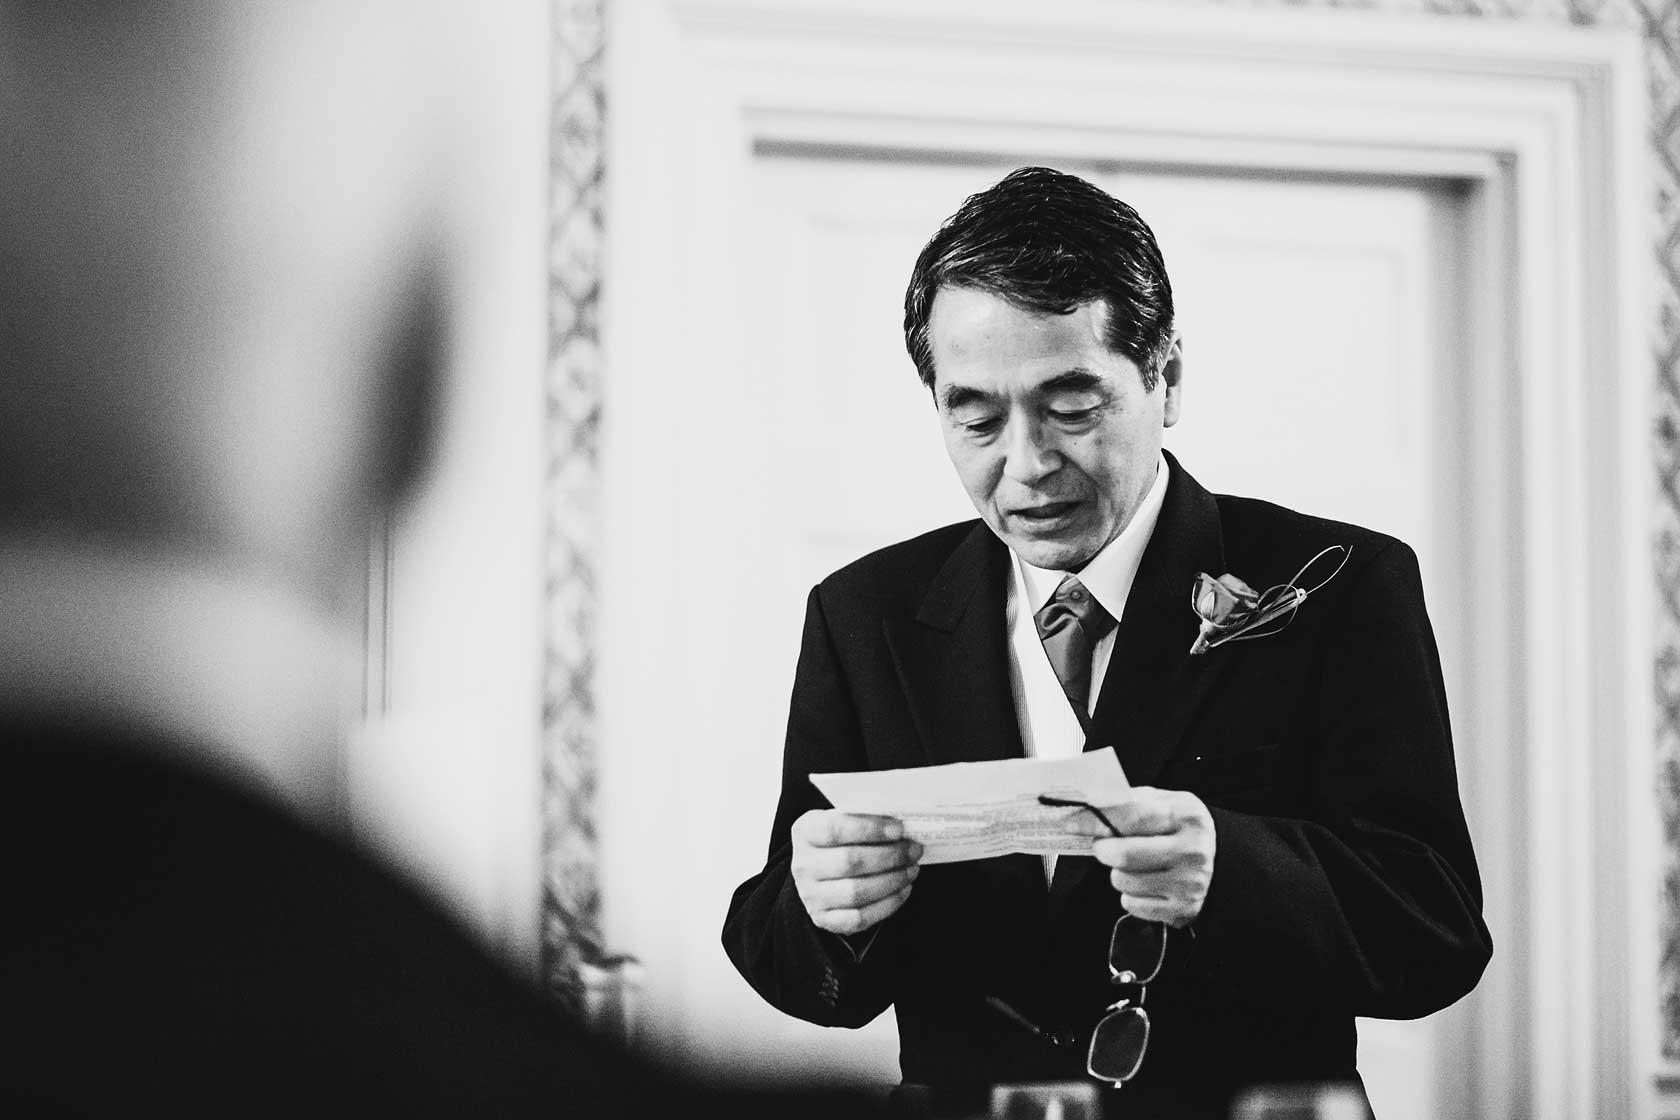 Reportage Wedding Photography at Hampden House